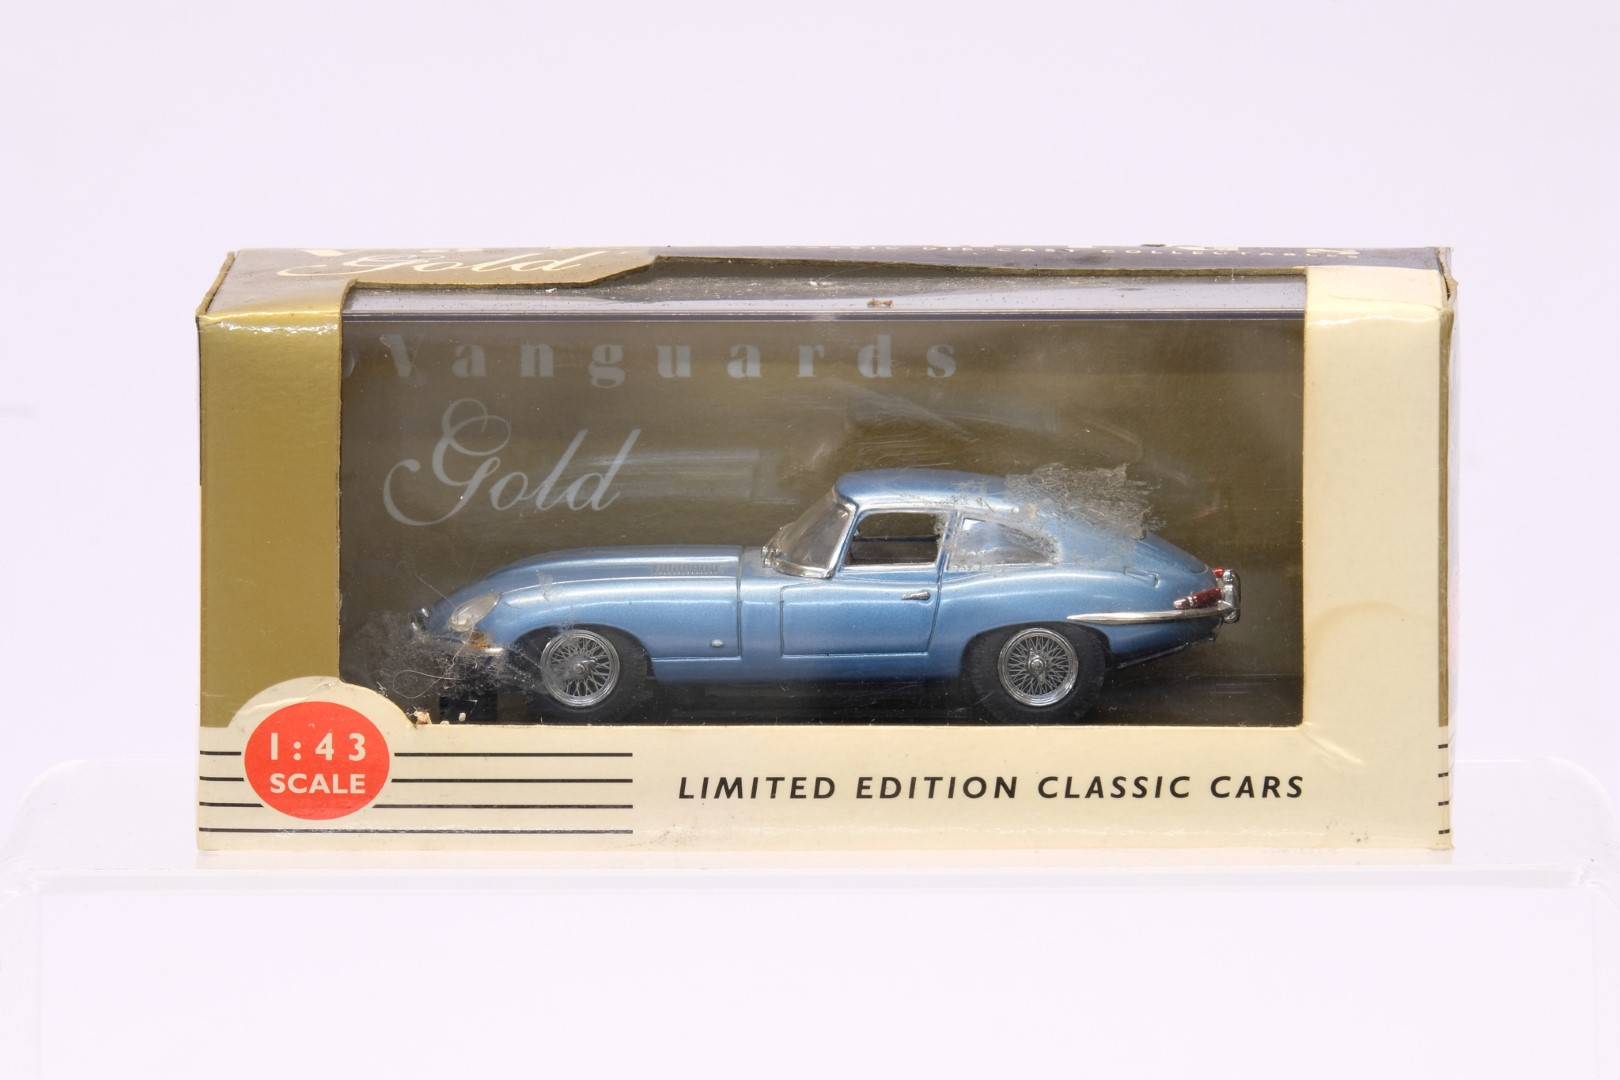 Vanguards 4 Boxed Car Models - Image 3 of 5